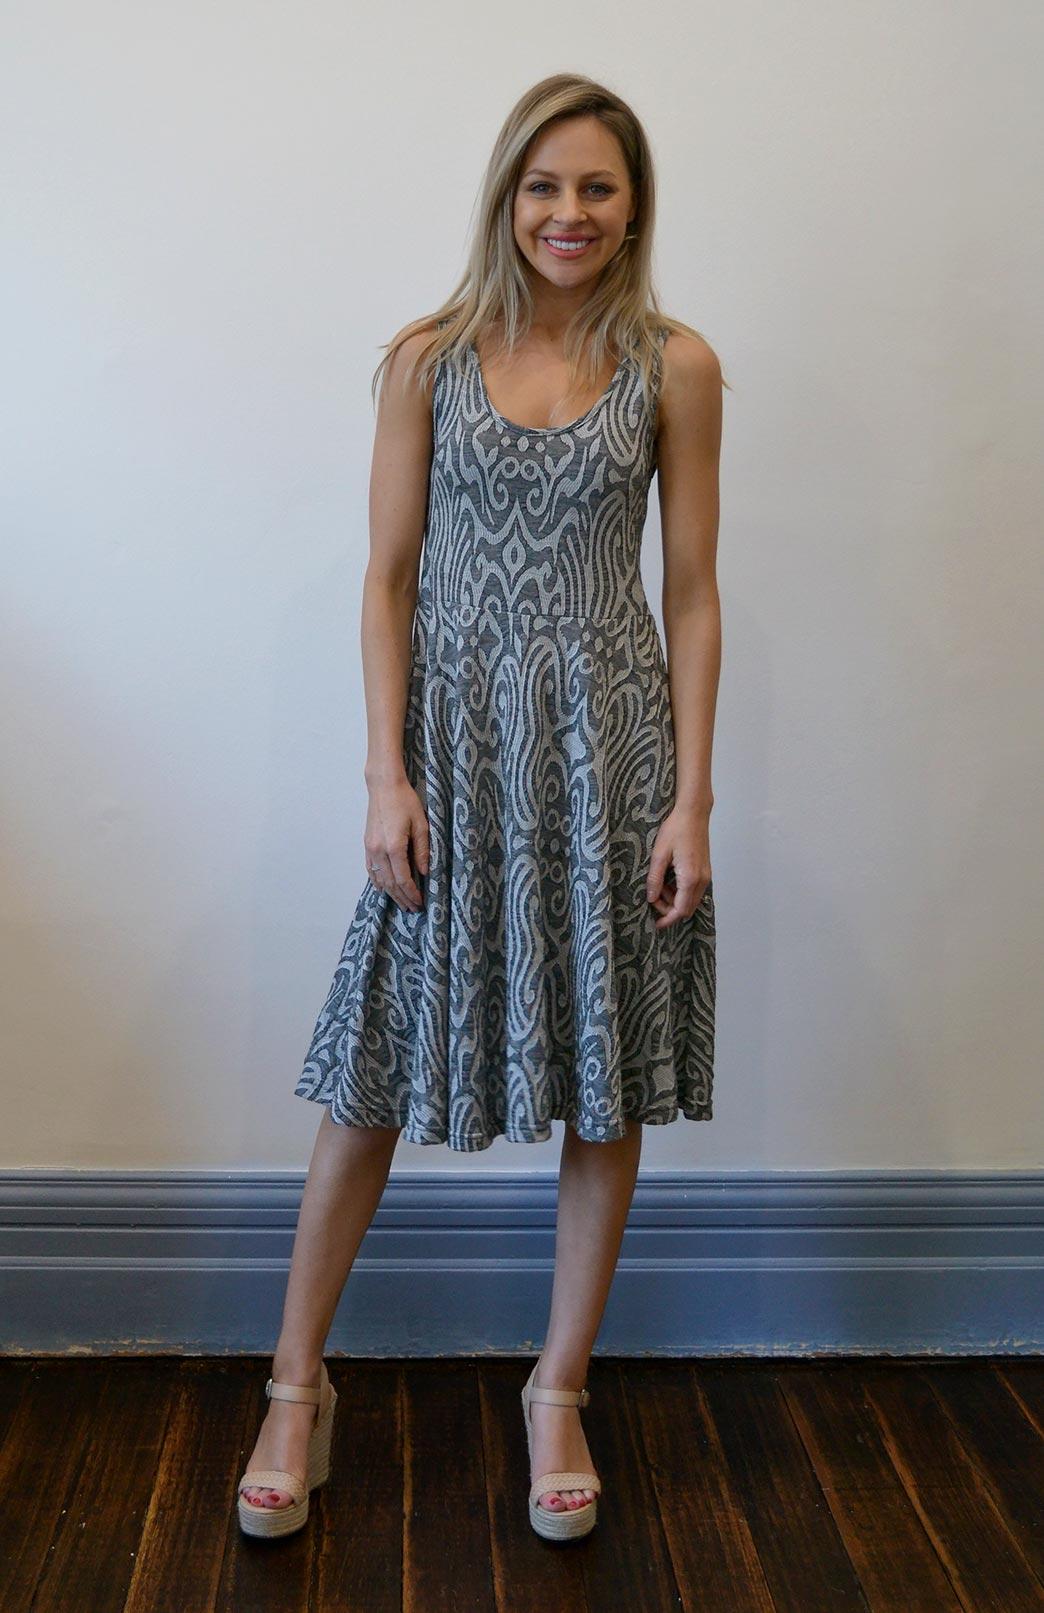 Sleeveless Jackie Dress - Women's Patterned Merino Wool Sleeveless Summer Dress - Smitten Merino Tasmania Australia